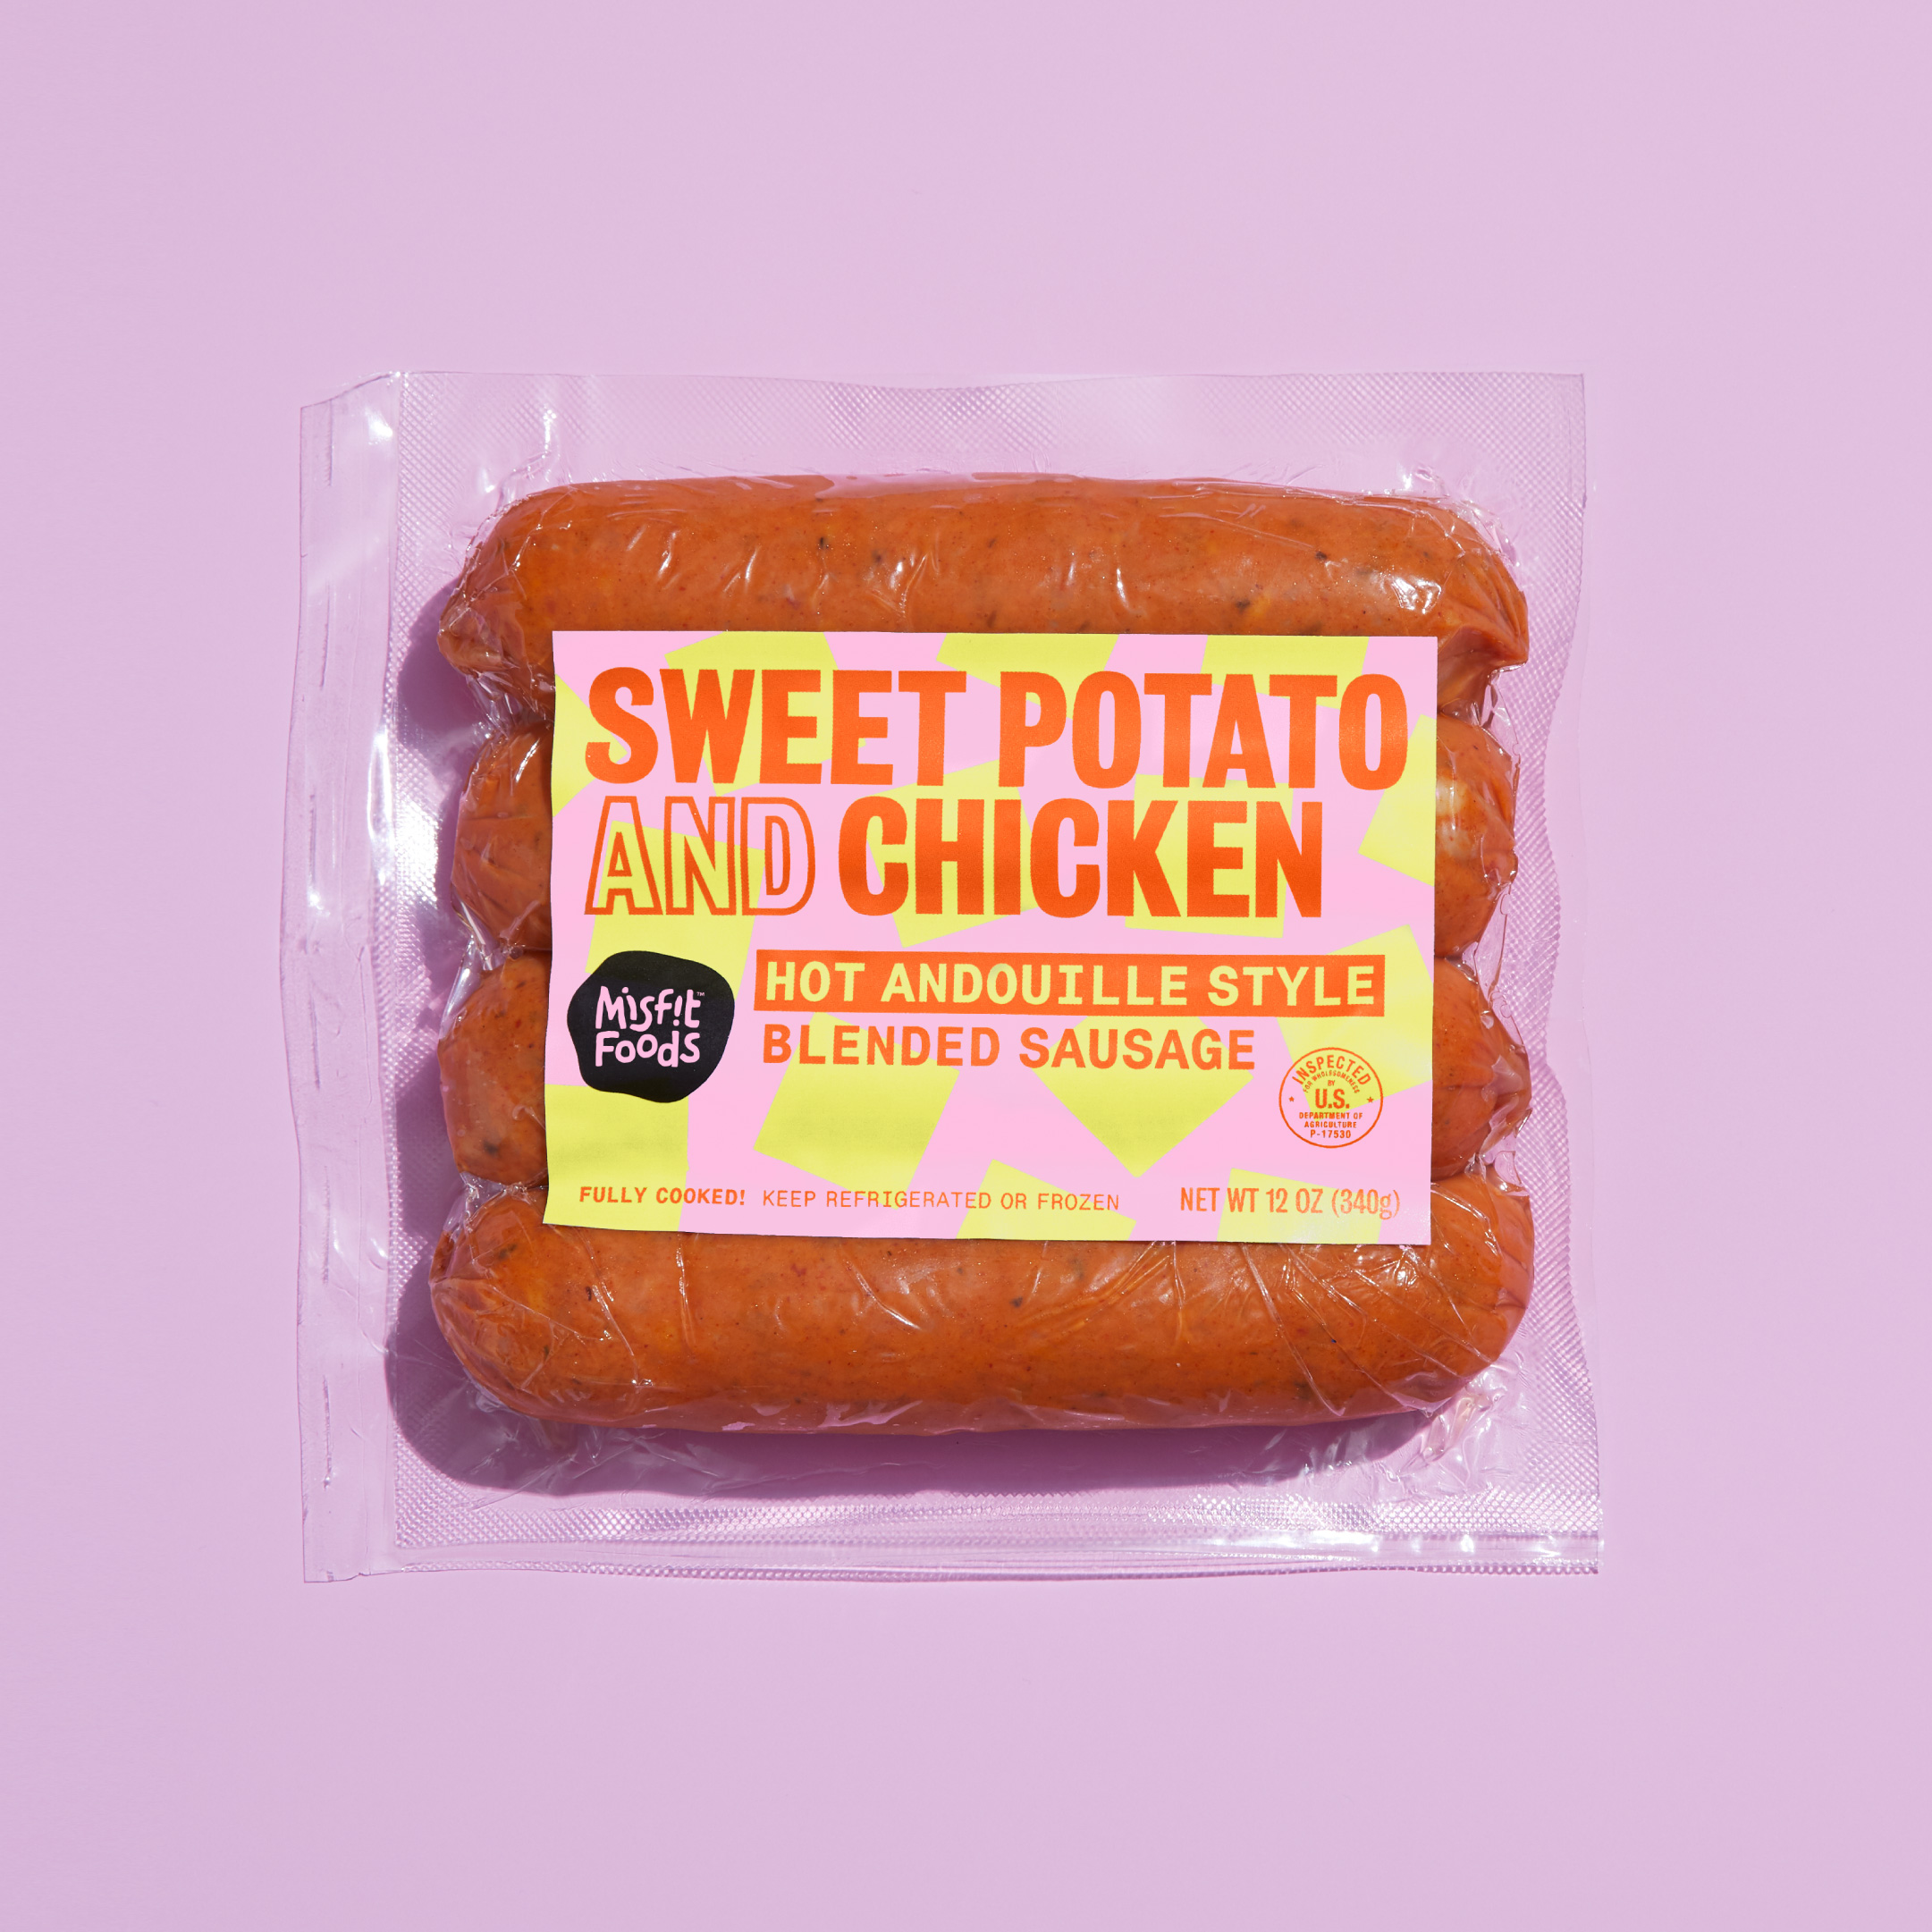 misfit-sweet-potato-package@2x.jpg